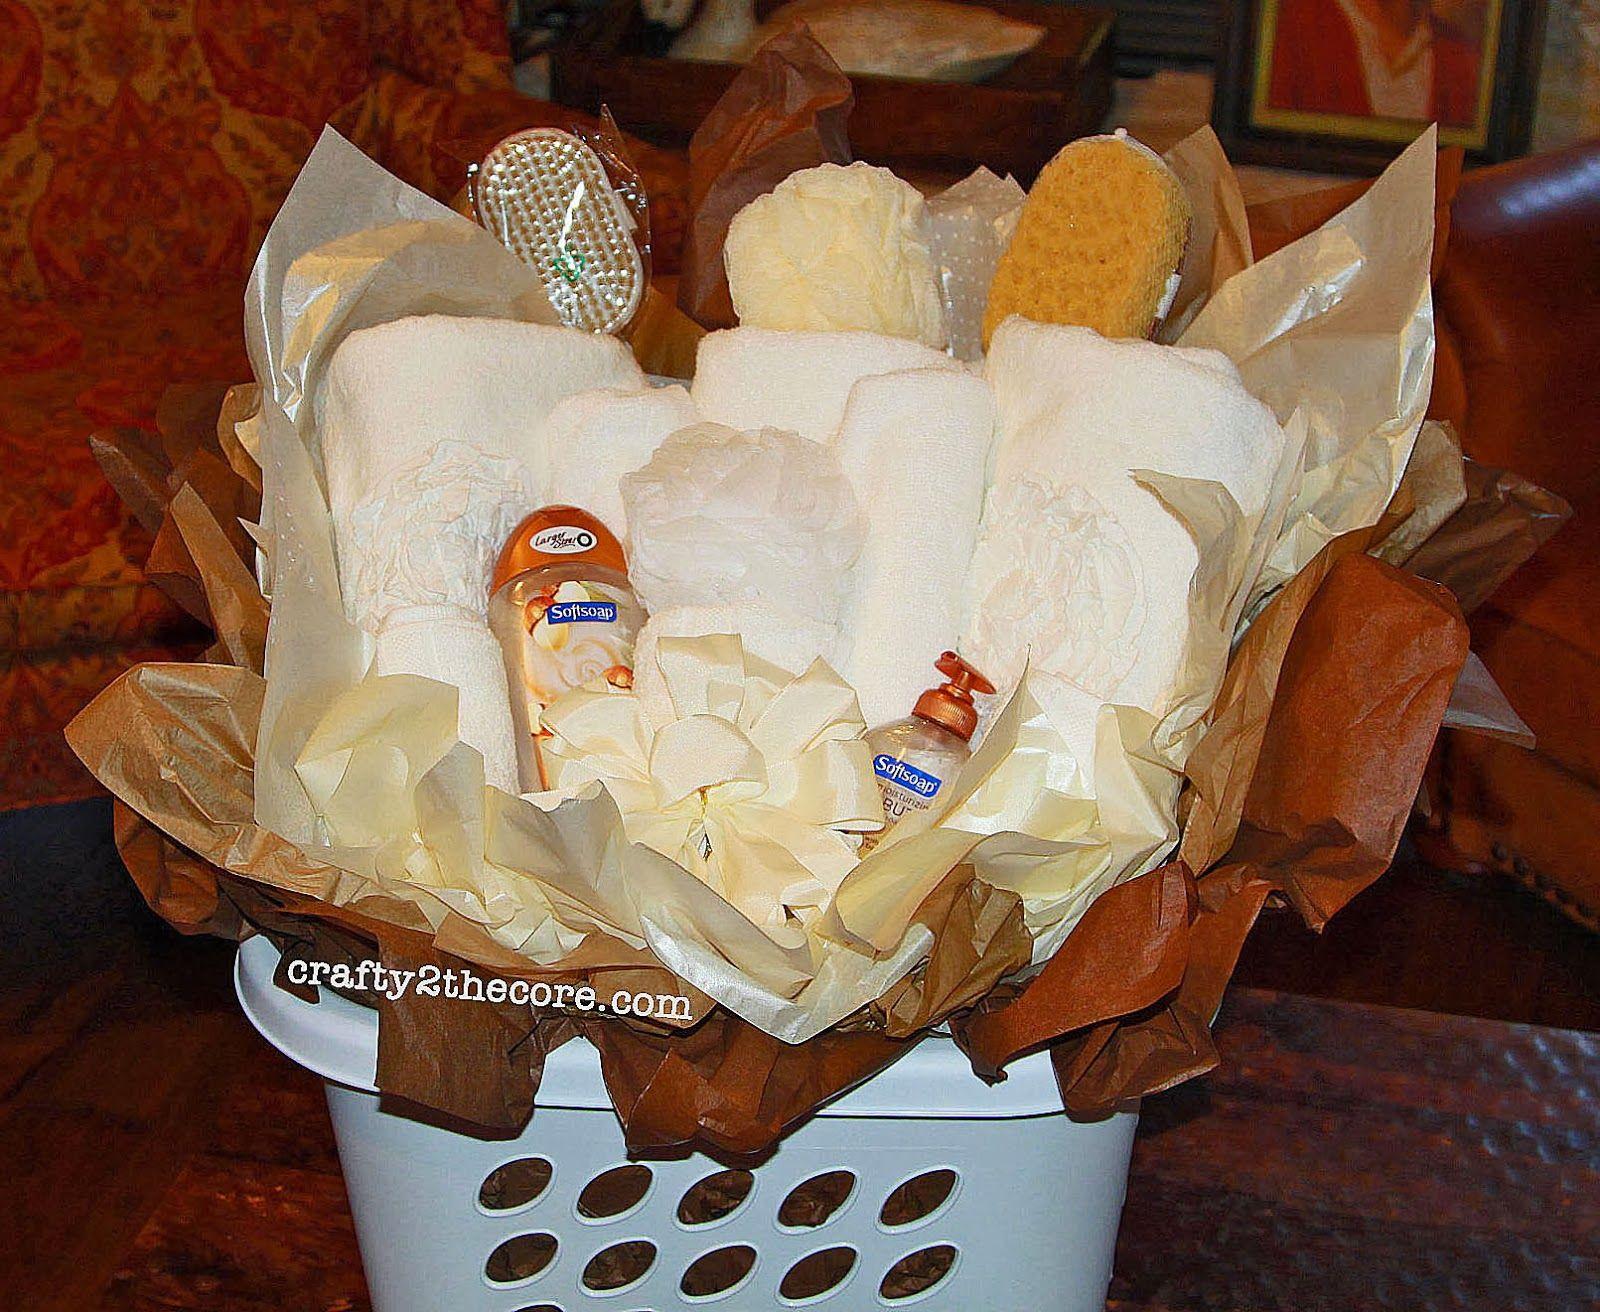 Creative Diy Wedding Gifts: DIY Wedding Gift Basket~ Using A Square Laundry Basket And